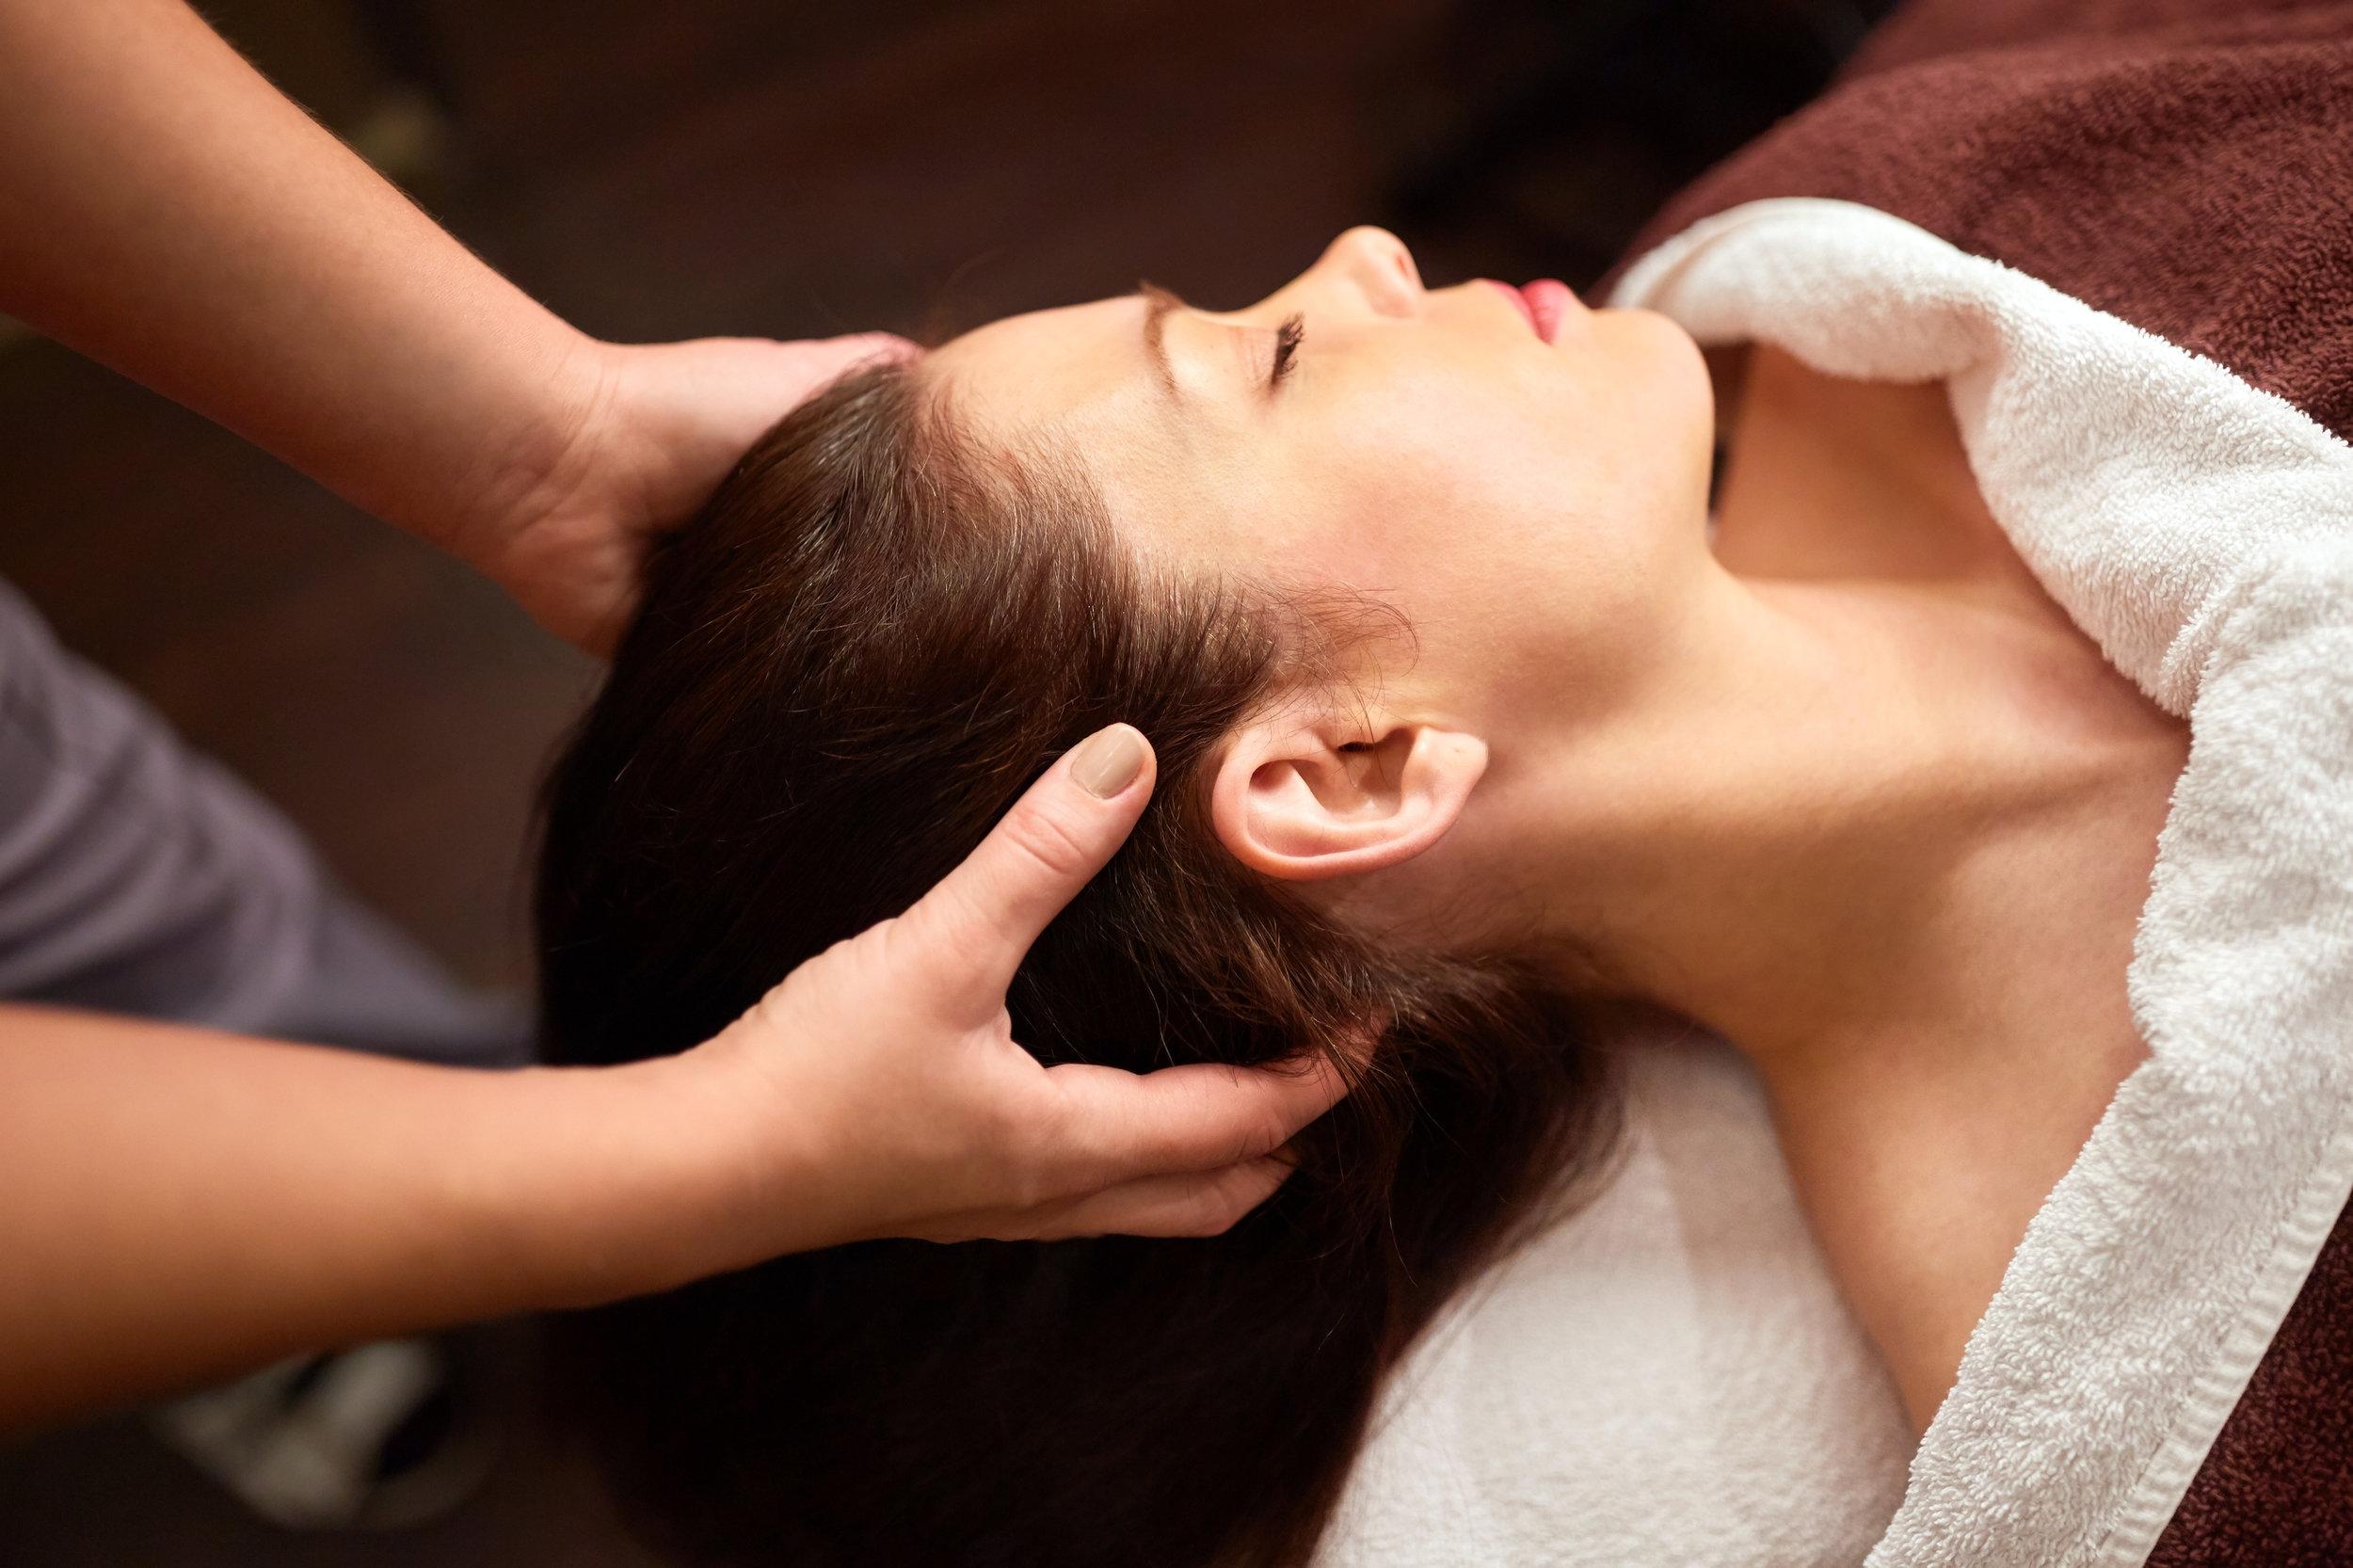 woman-having-head-massage-at-spa-PVTYS7B.jpg